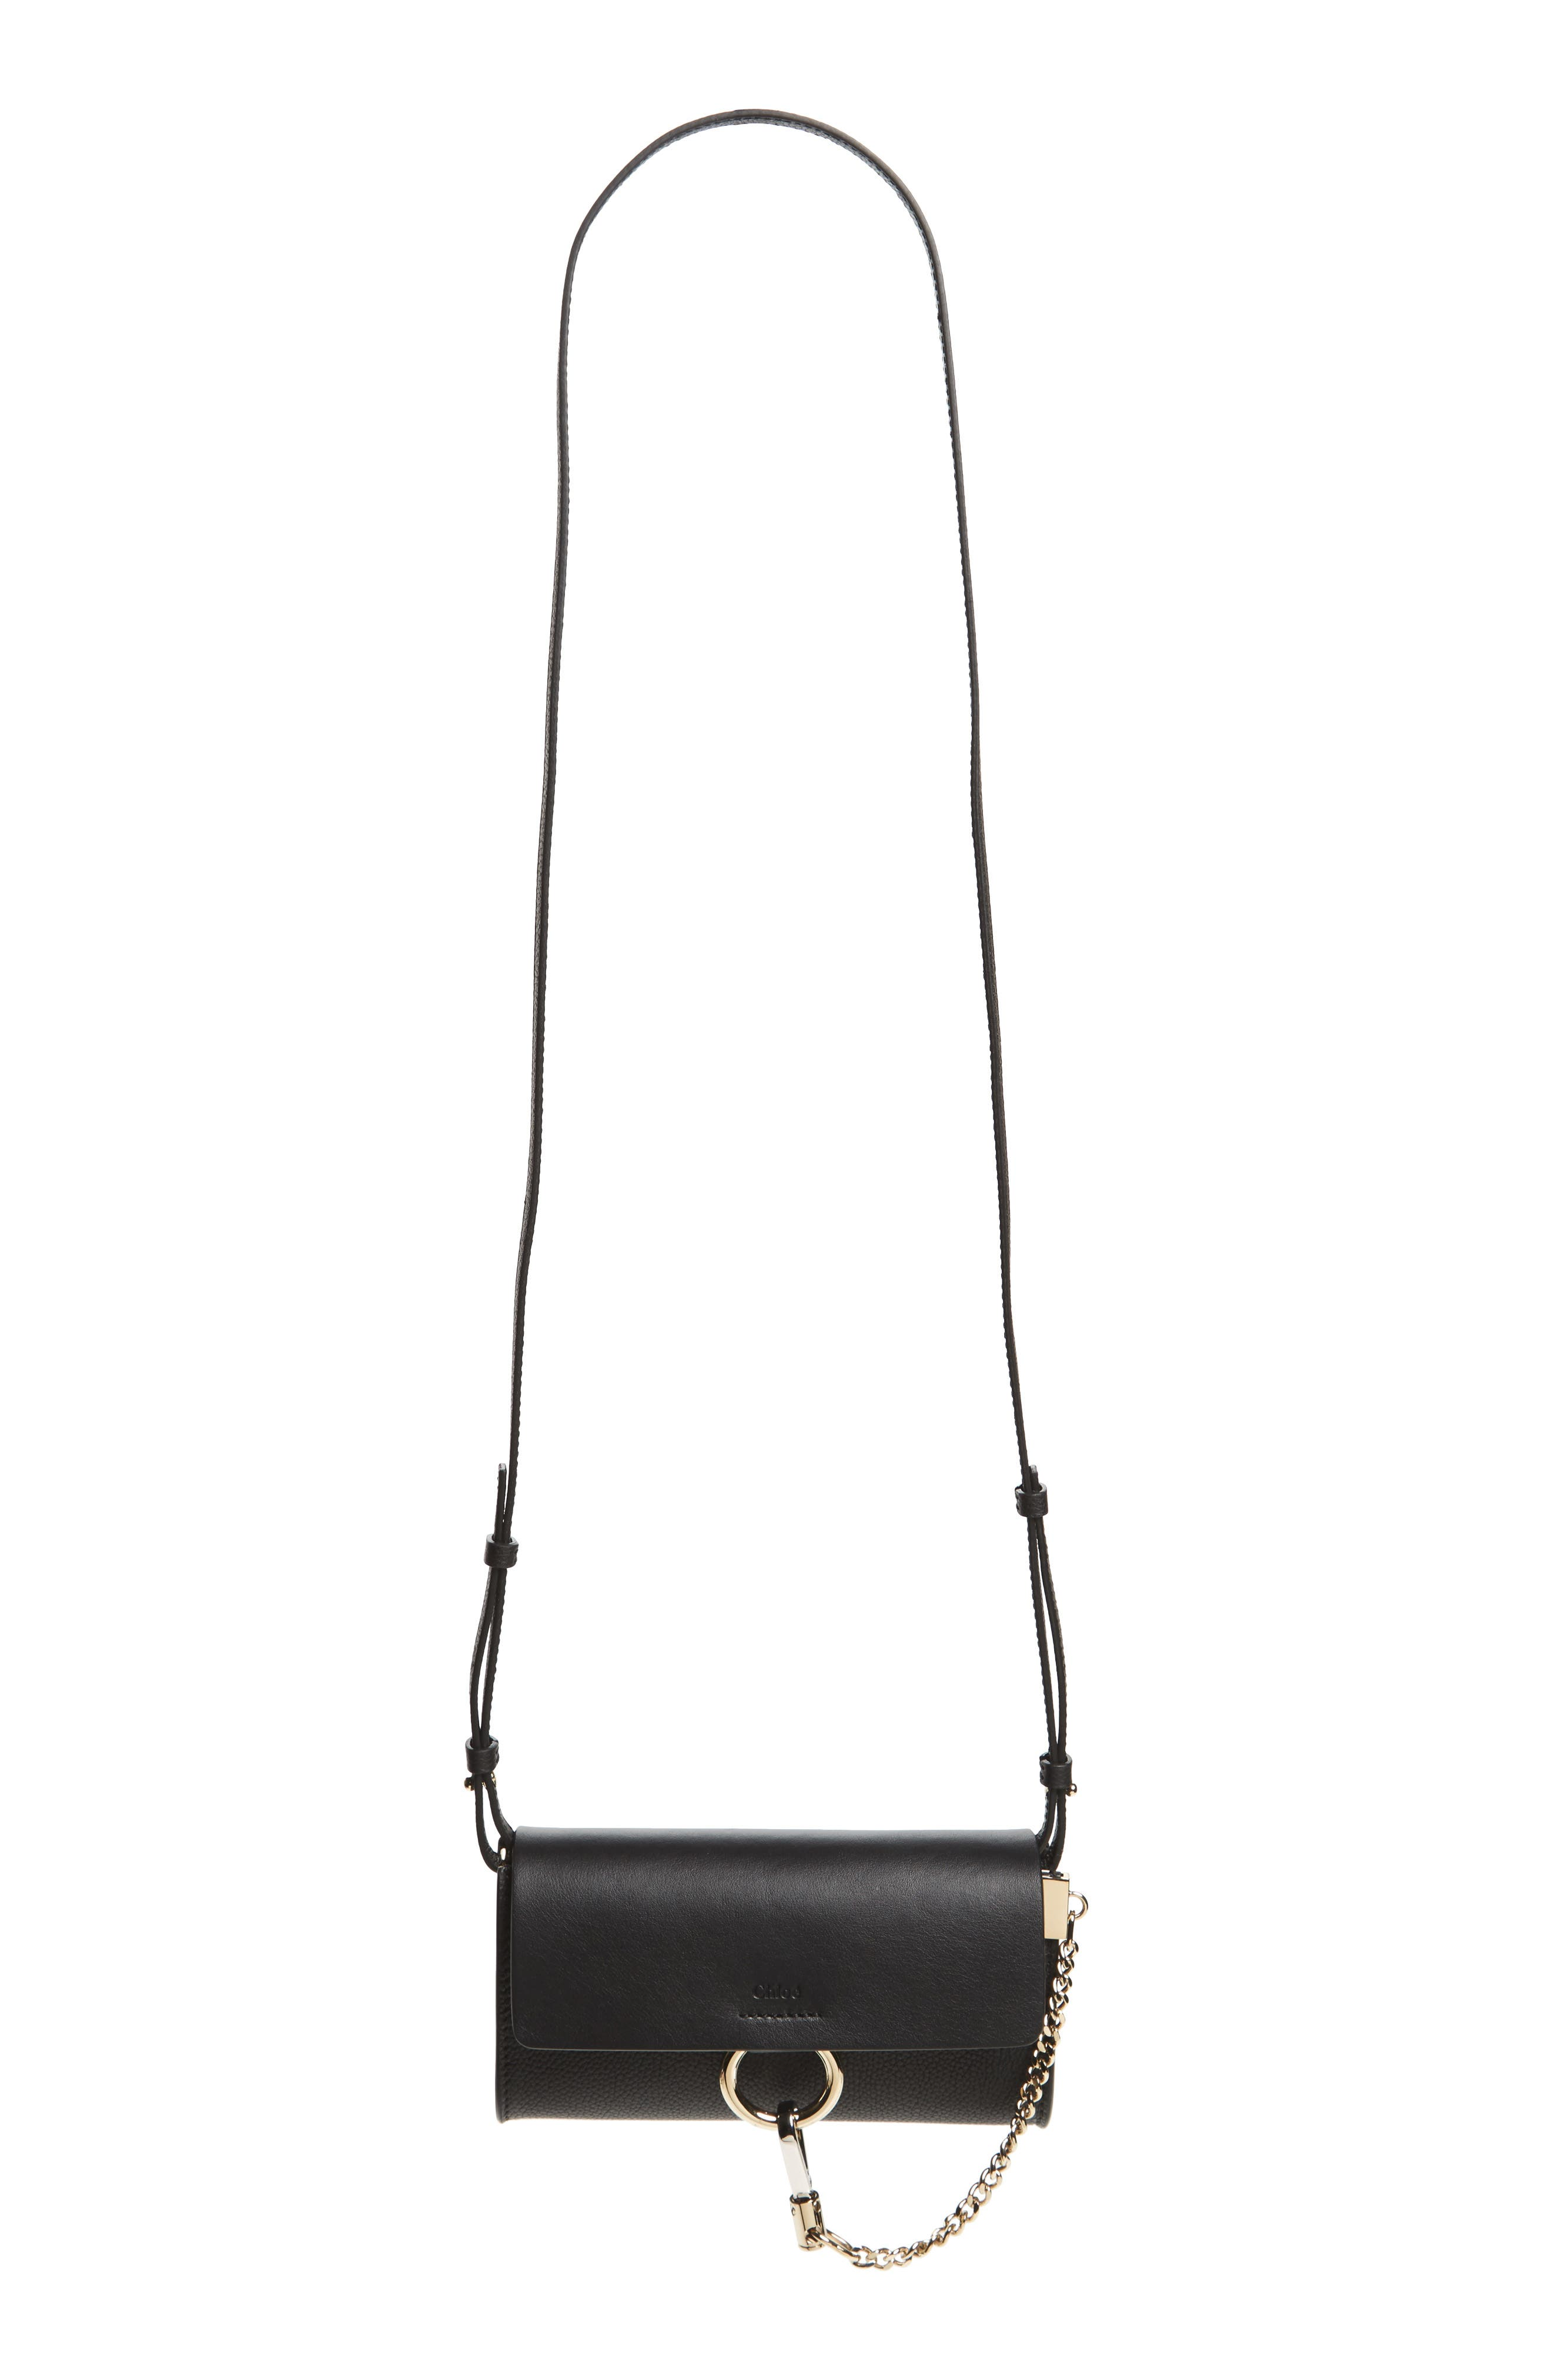 Chloé Faye Leather Wallet on a Strap